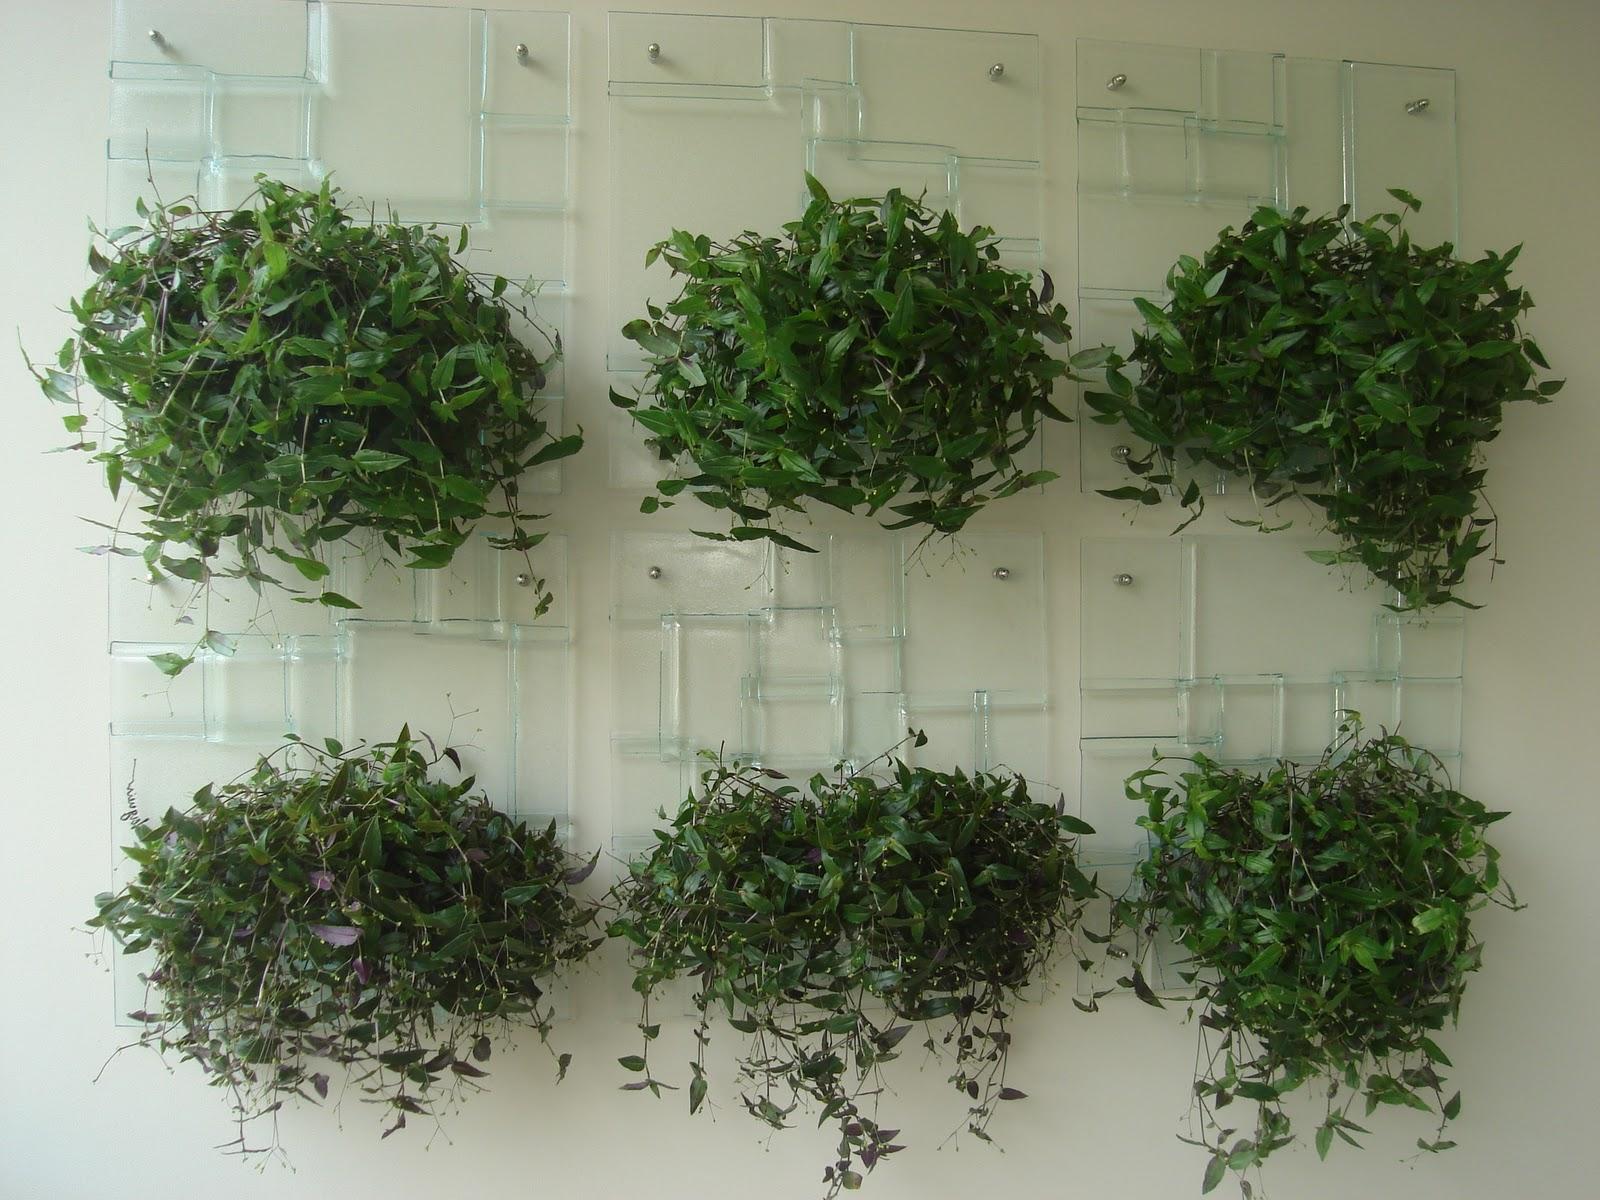 jardim vertical imagens:Jardins verticais